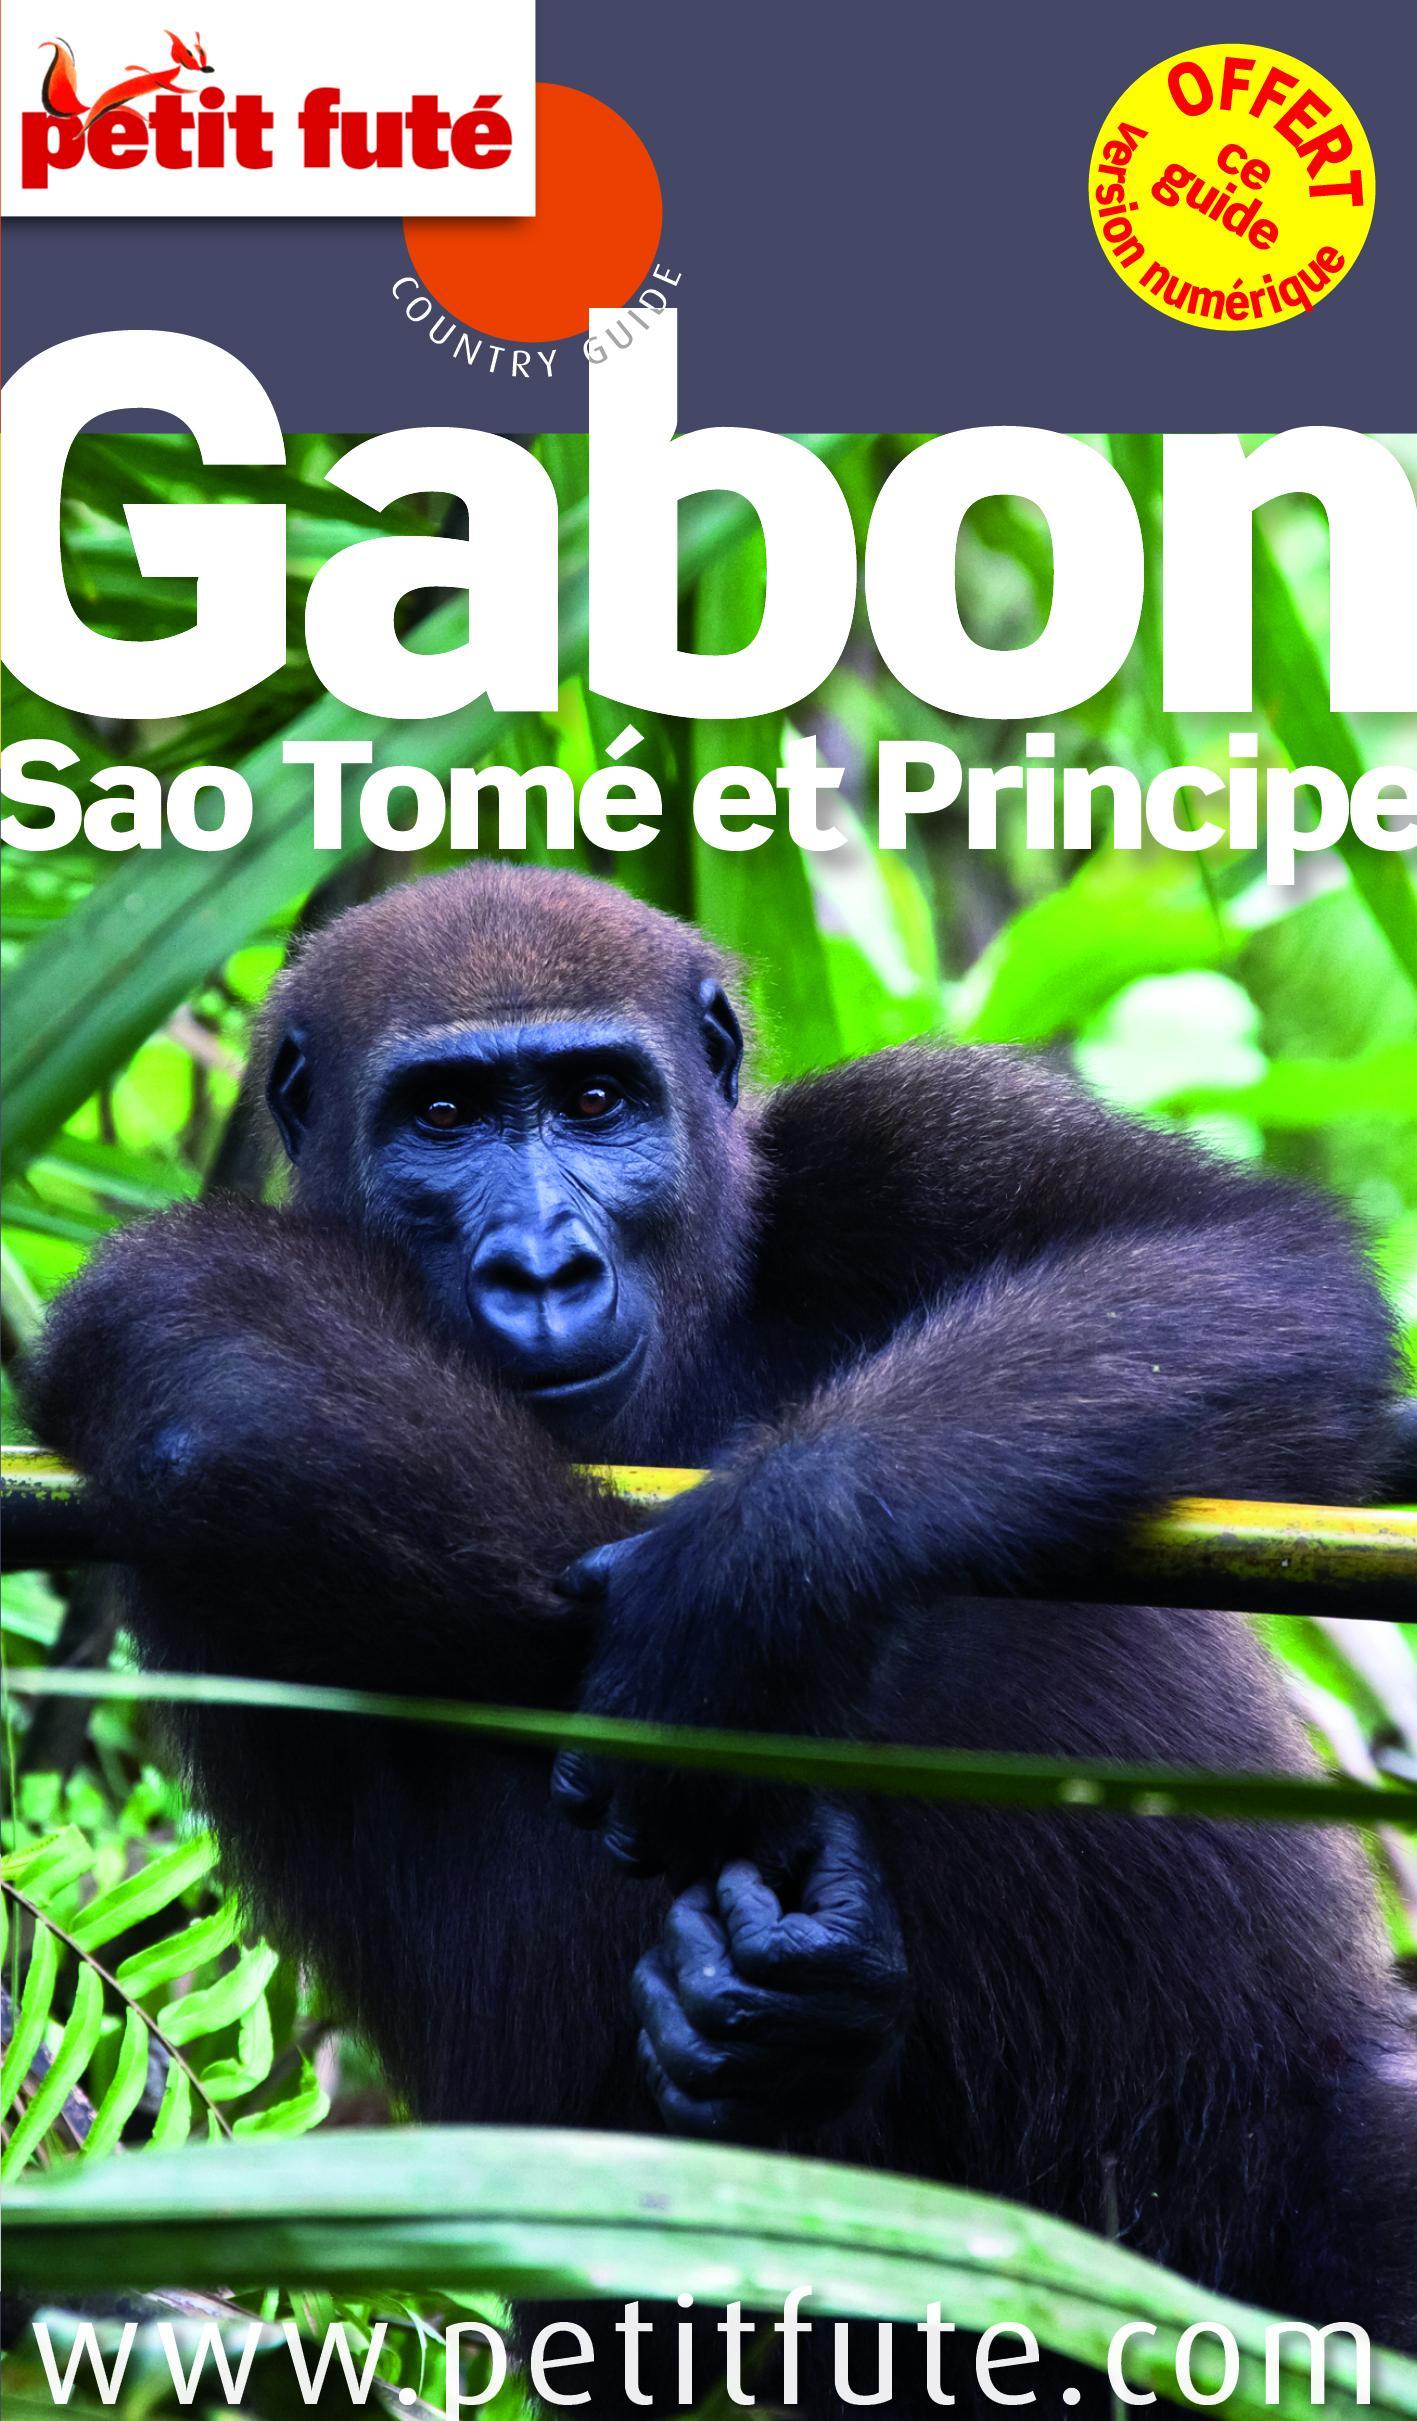 Reisgids Gabon et Sao Tome   Petit Fute